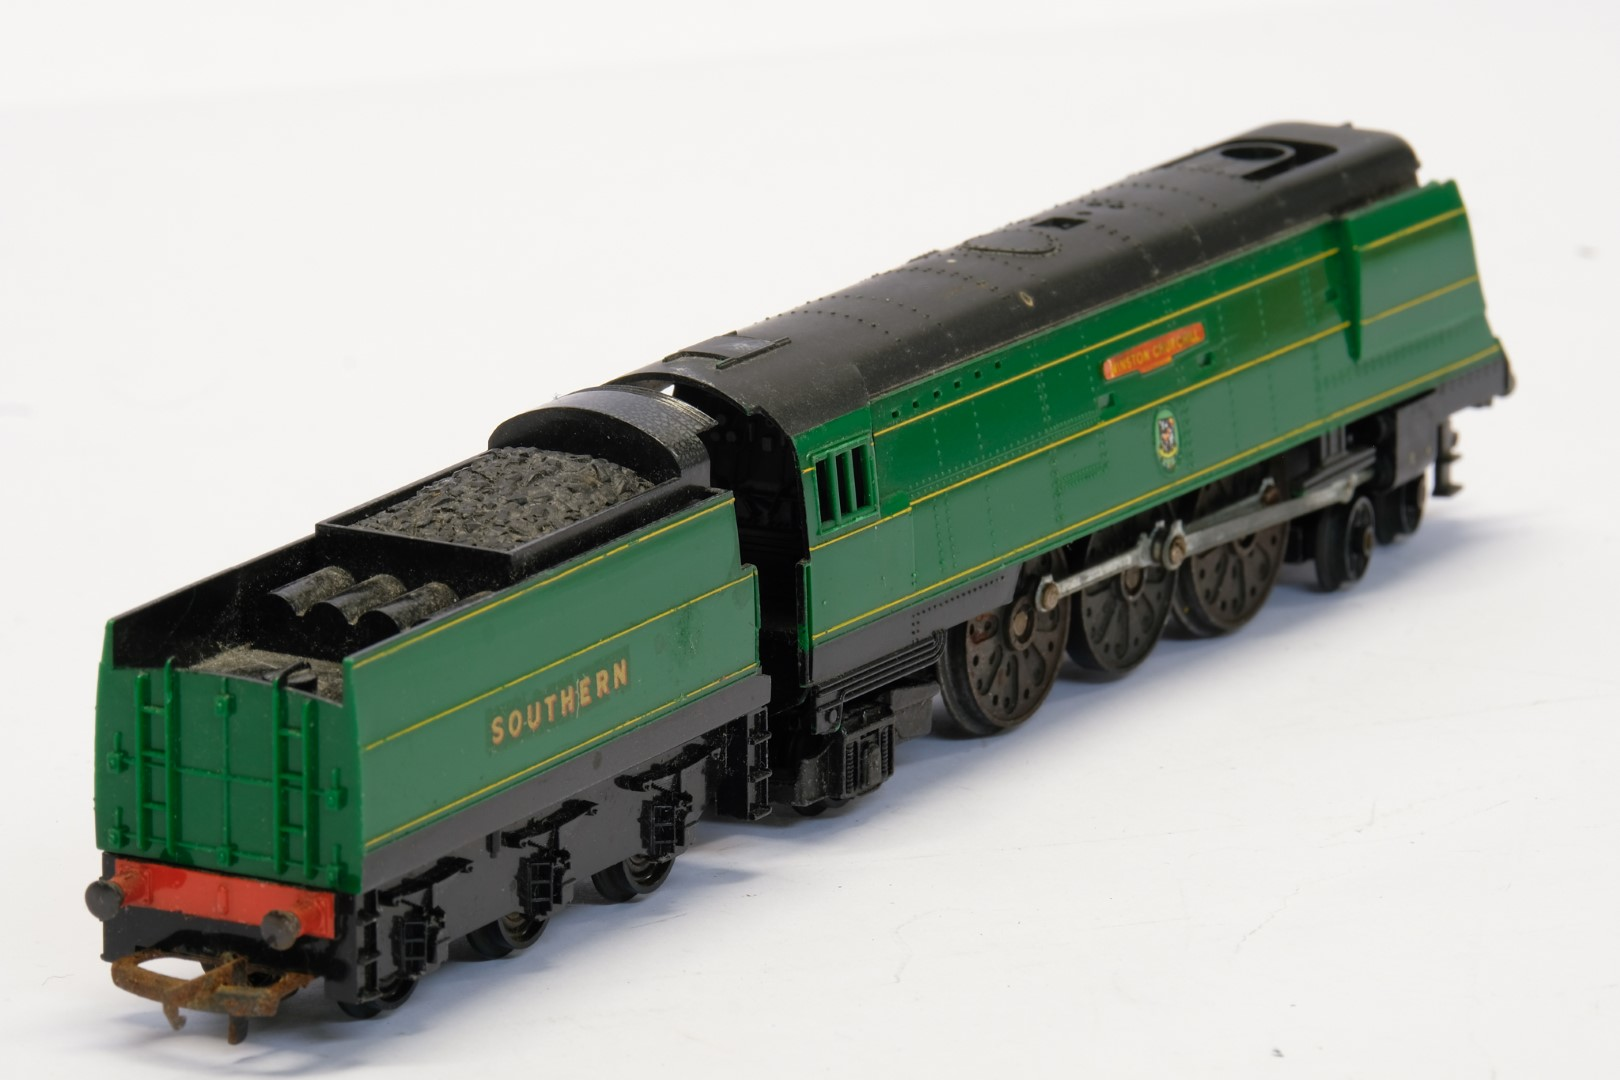 Tri-ang Winston Churchill Locomotive and Tender - Southern - 21C151 - No Box - Image 3 of 3